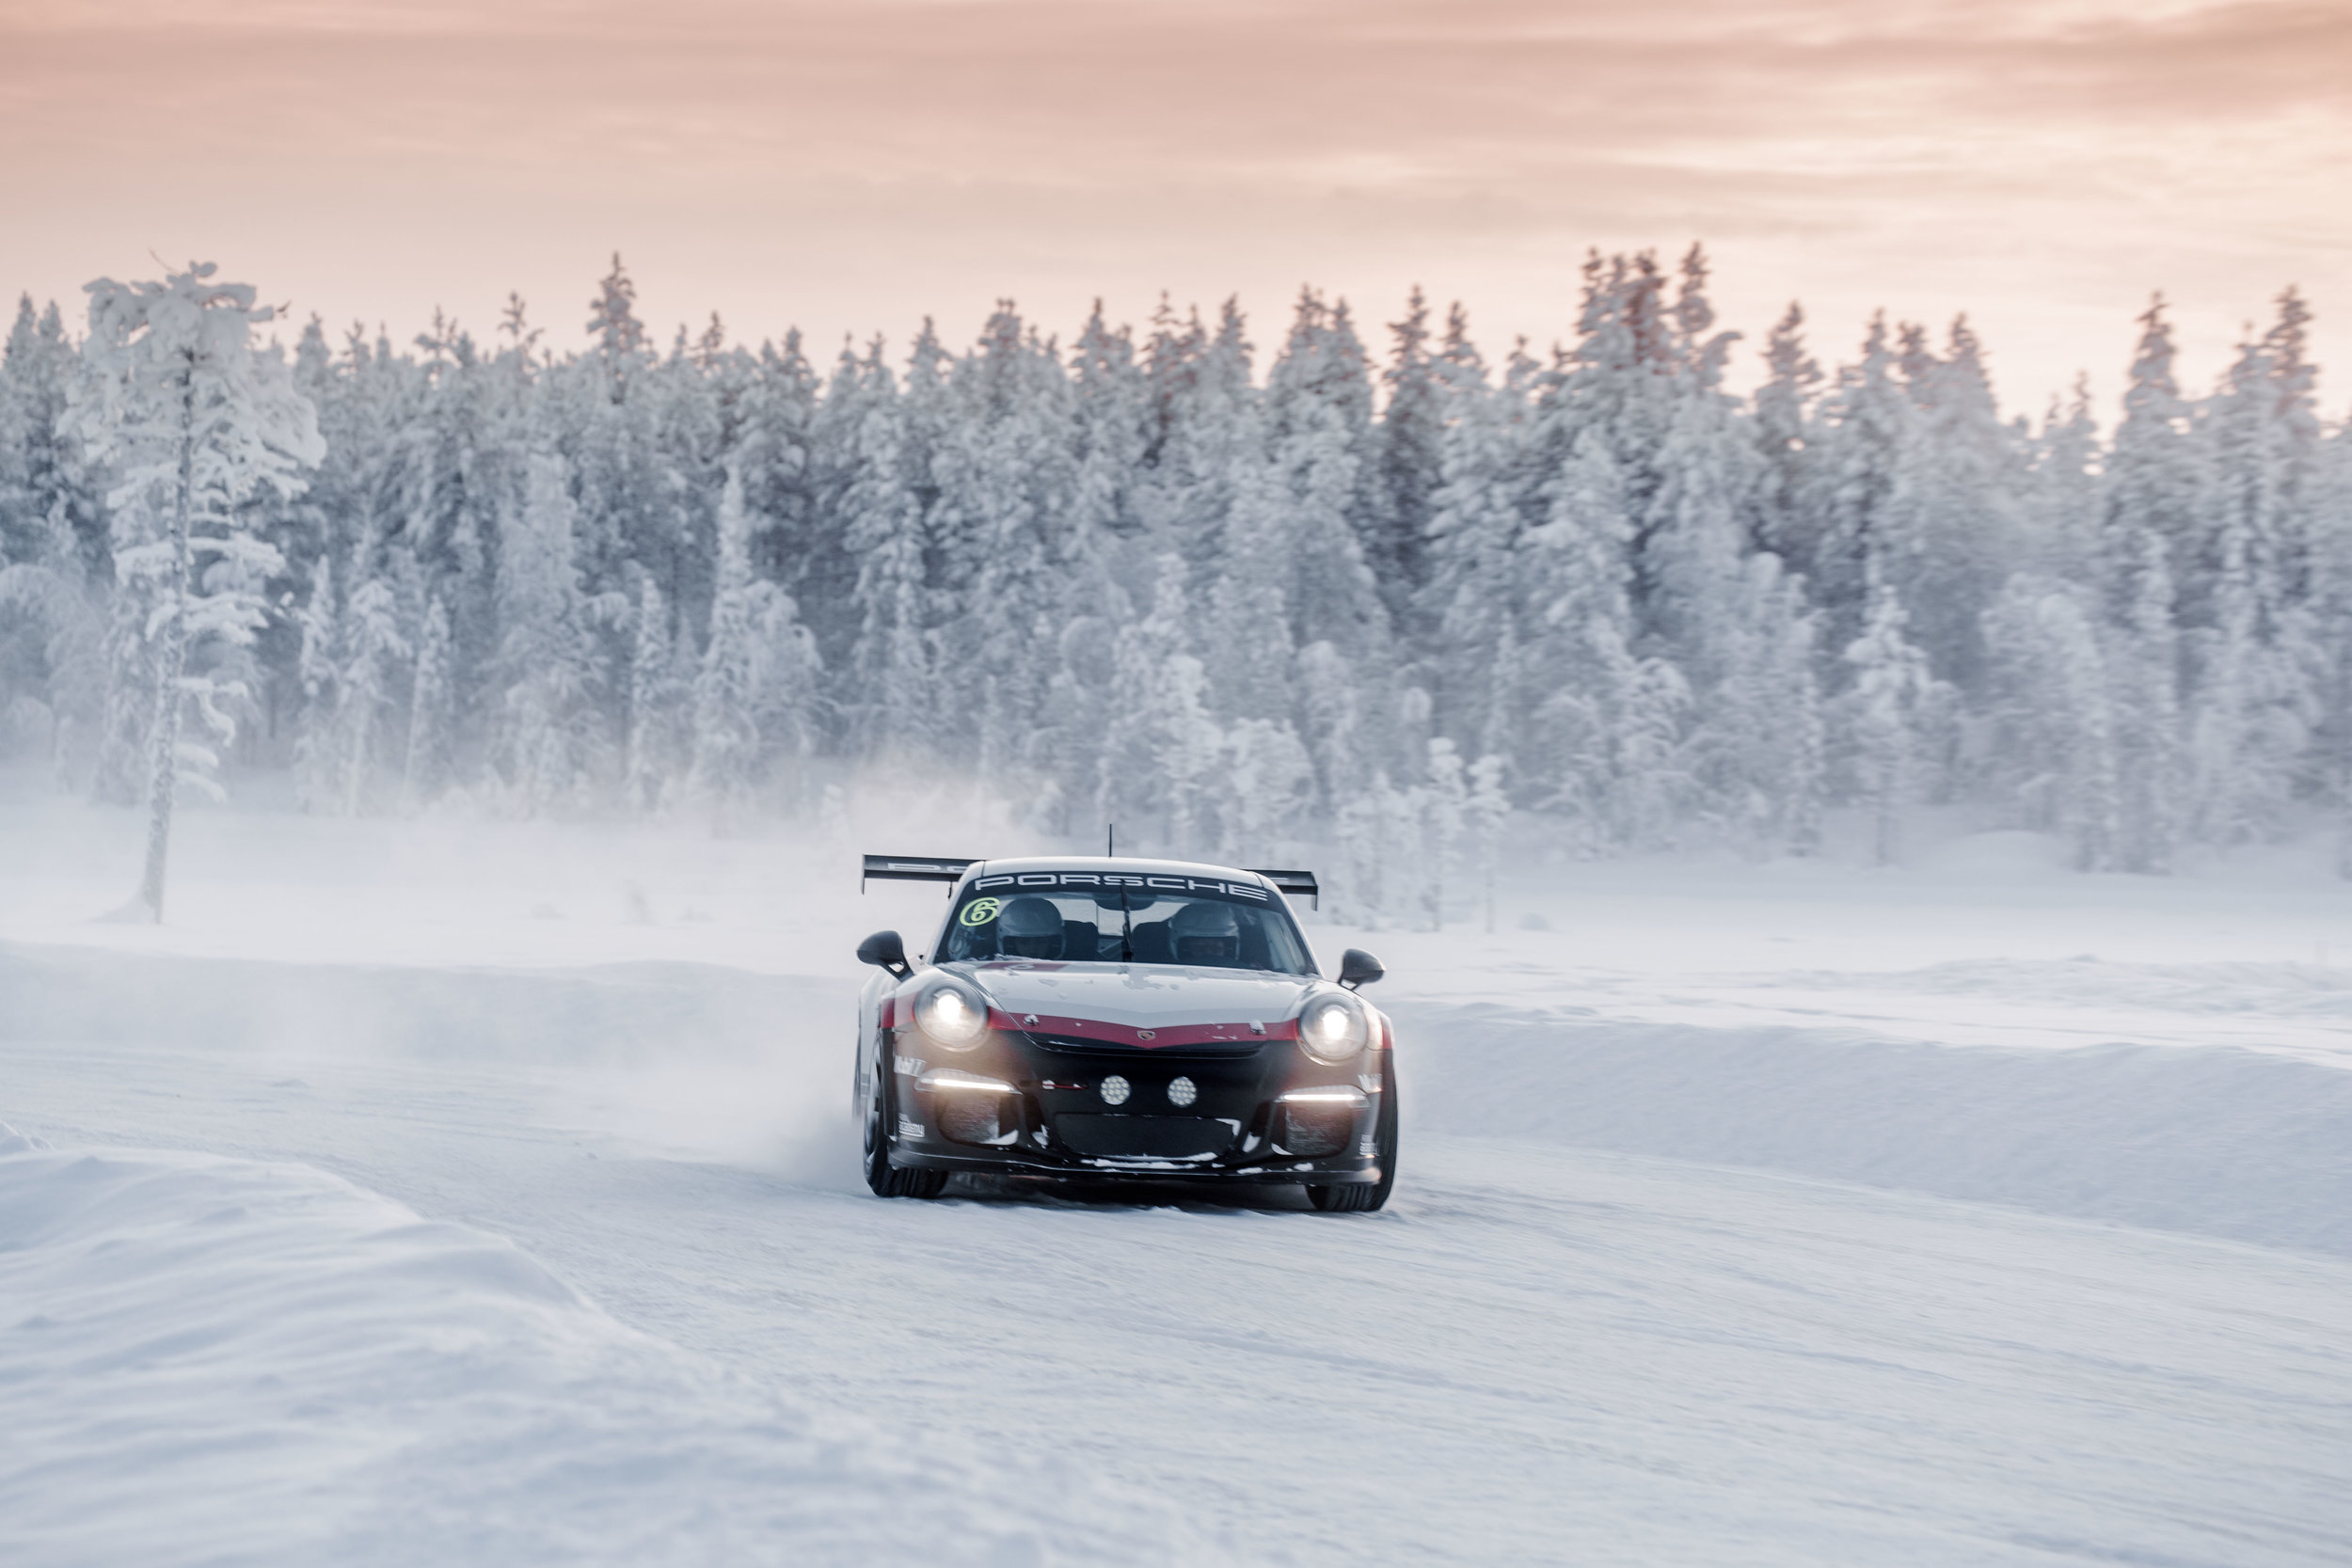 Porsche Ice Experience on Ice_30_01_2019_1392_175818.jpg